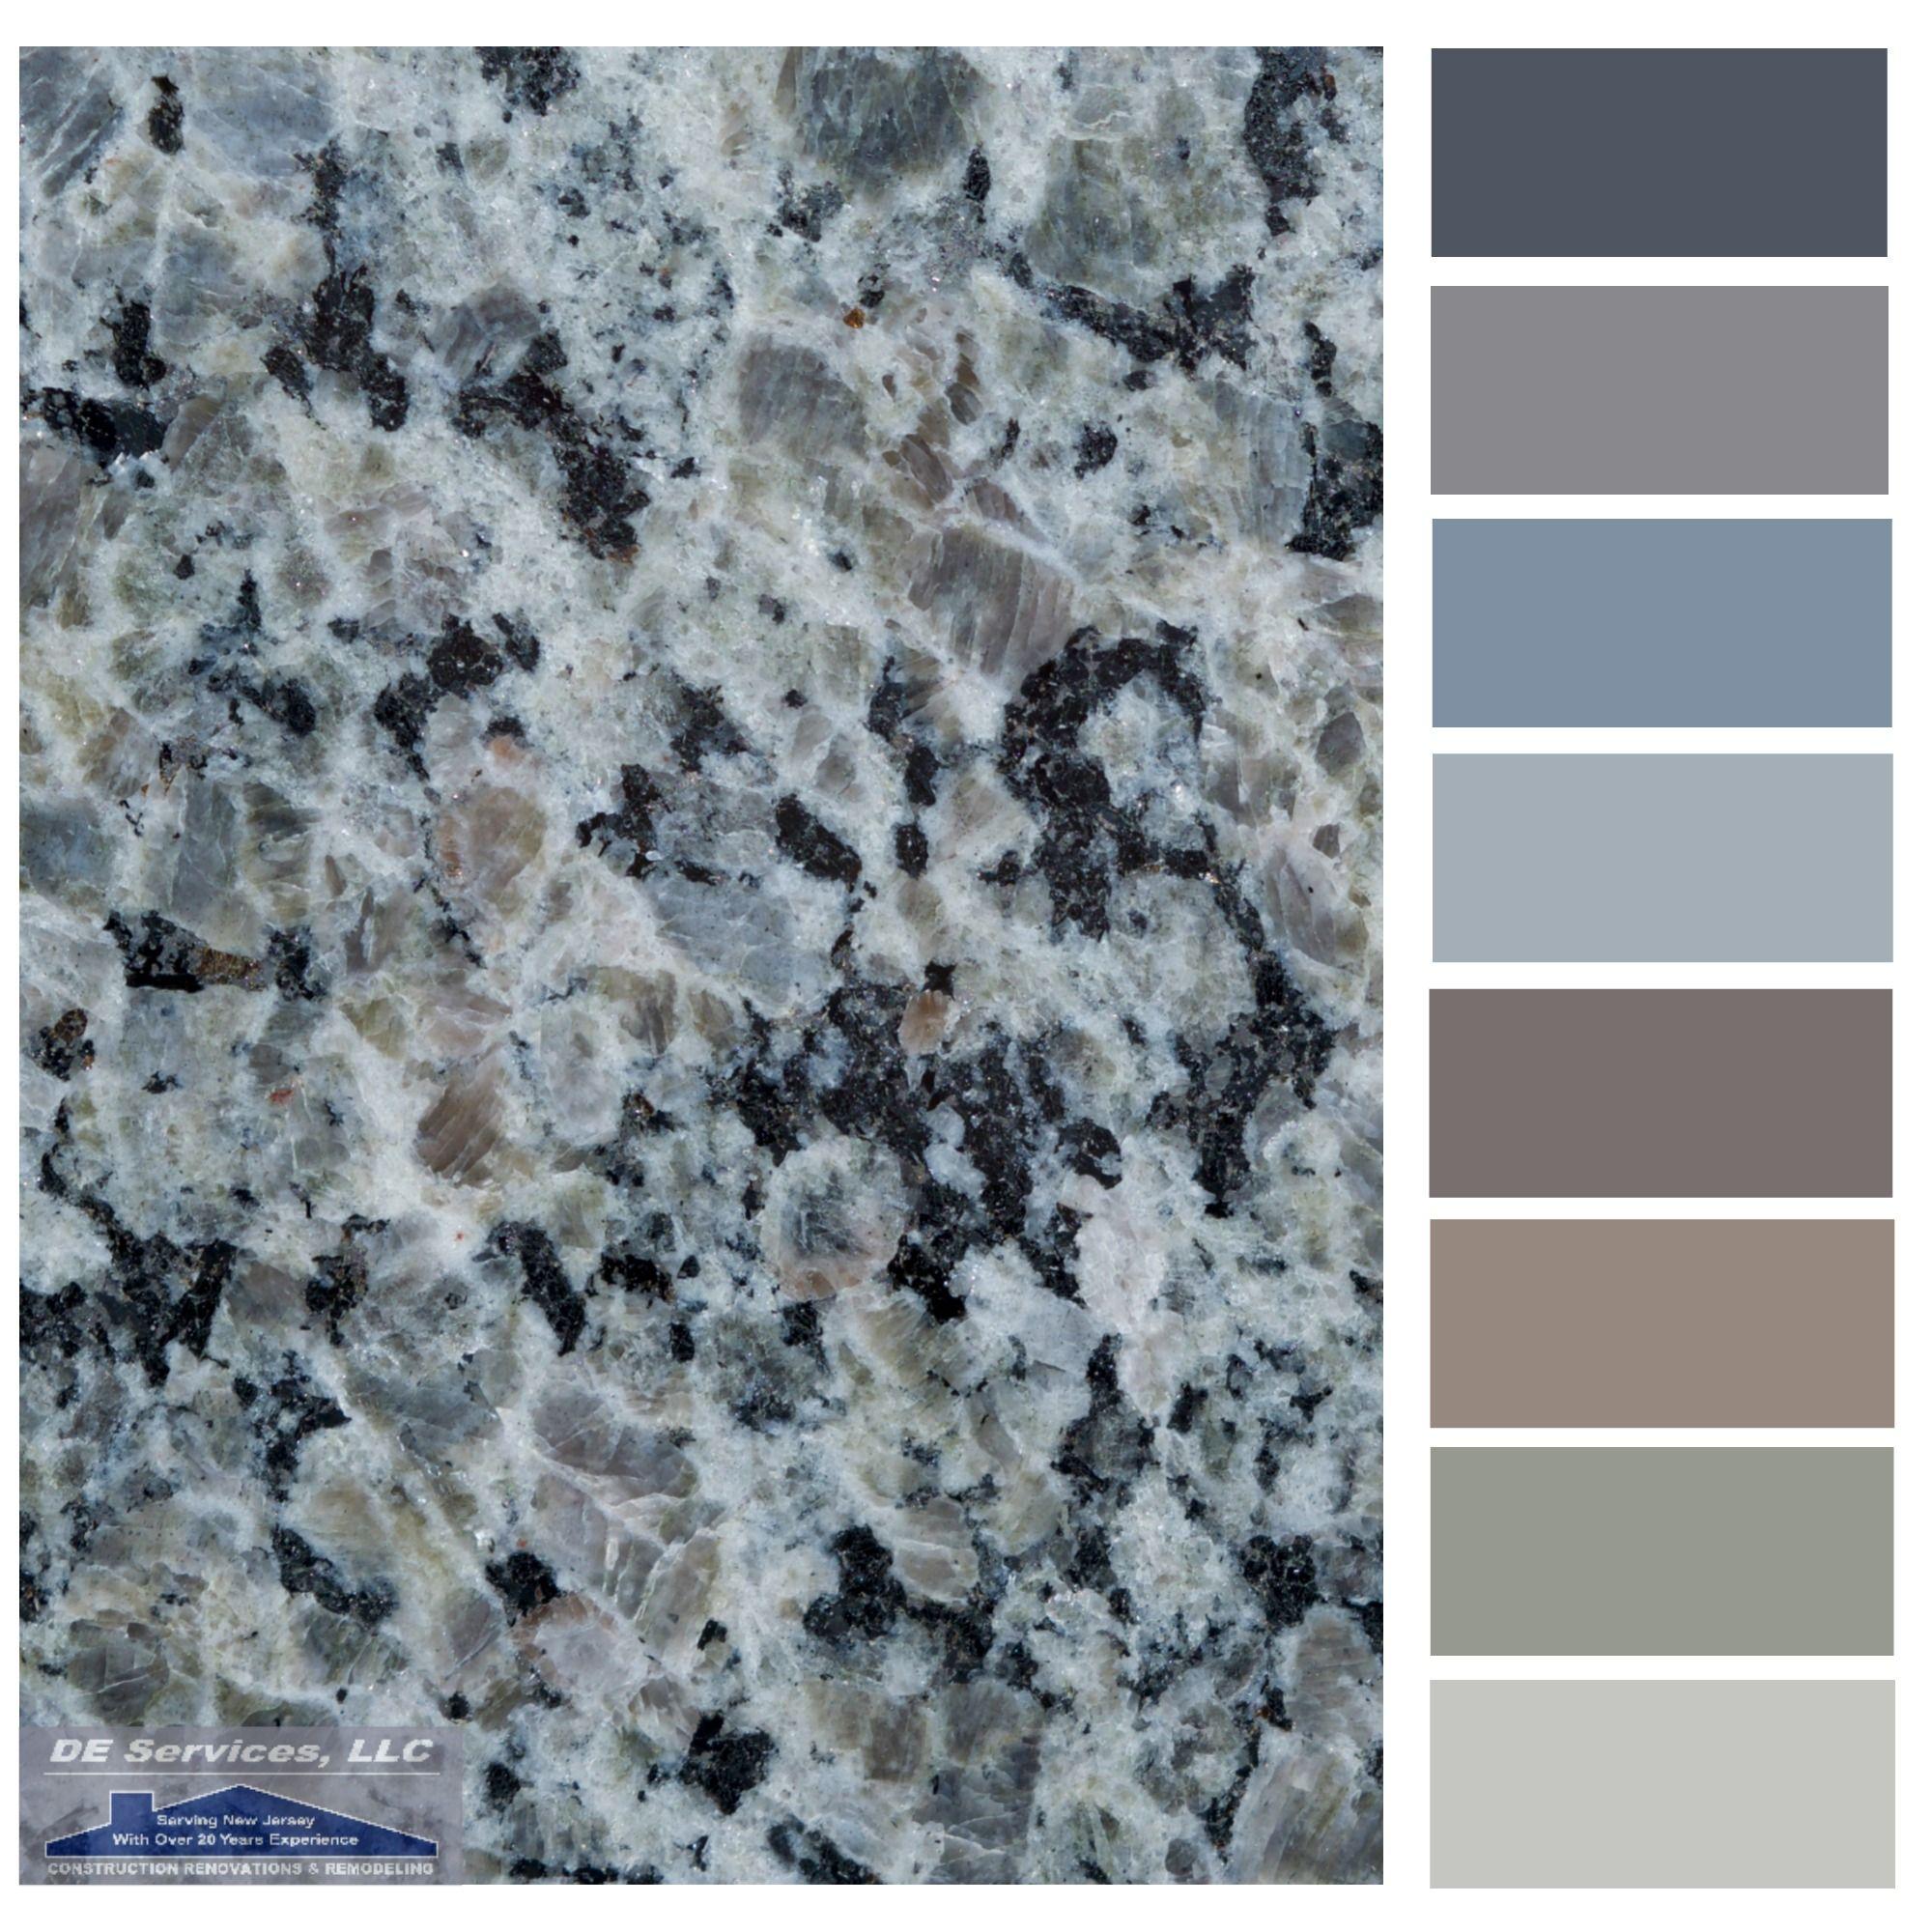 Granite Countertop Colors: Color Schemes In 2019…